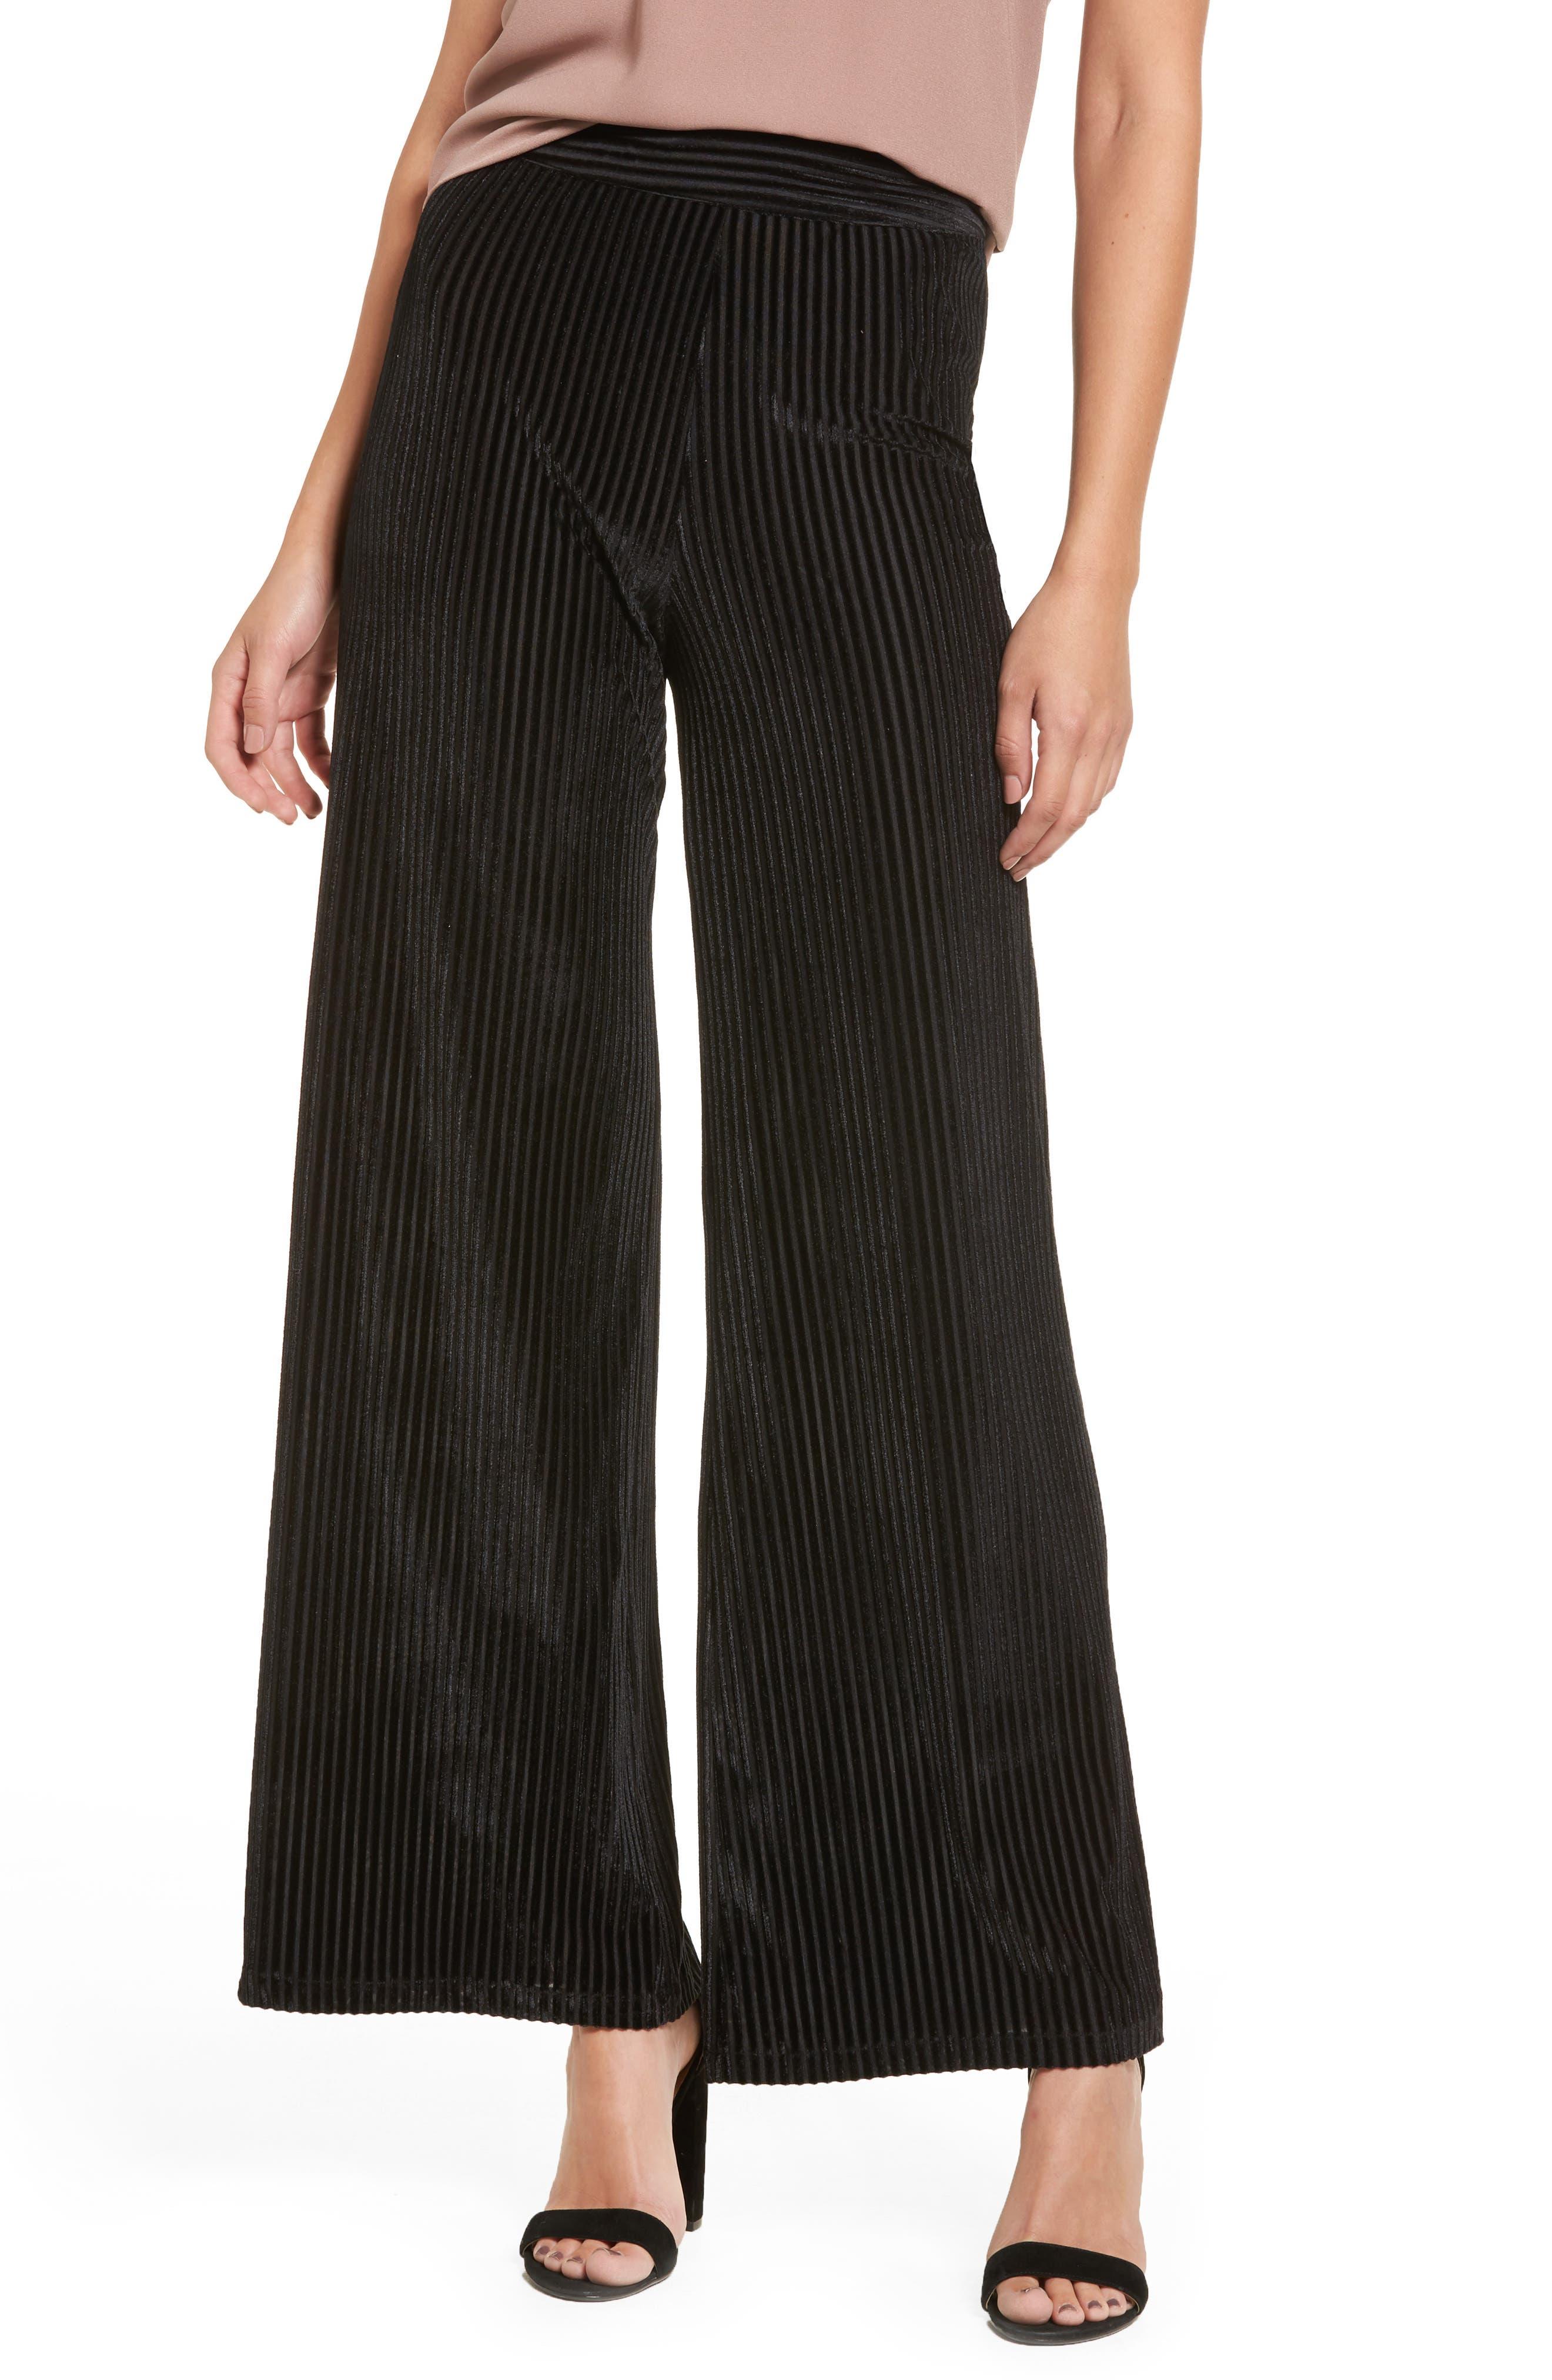 Tularosa Marley Velvet Pants